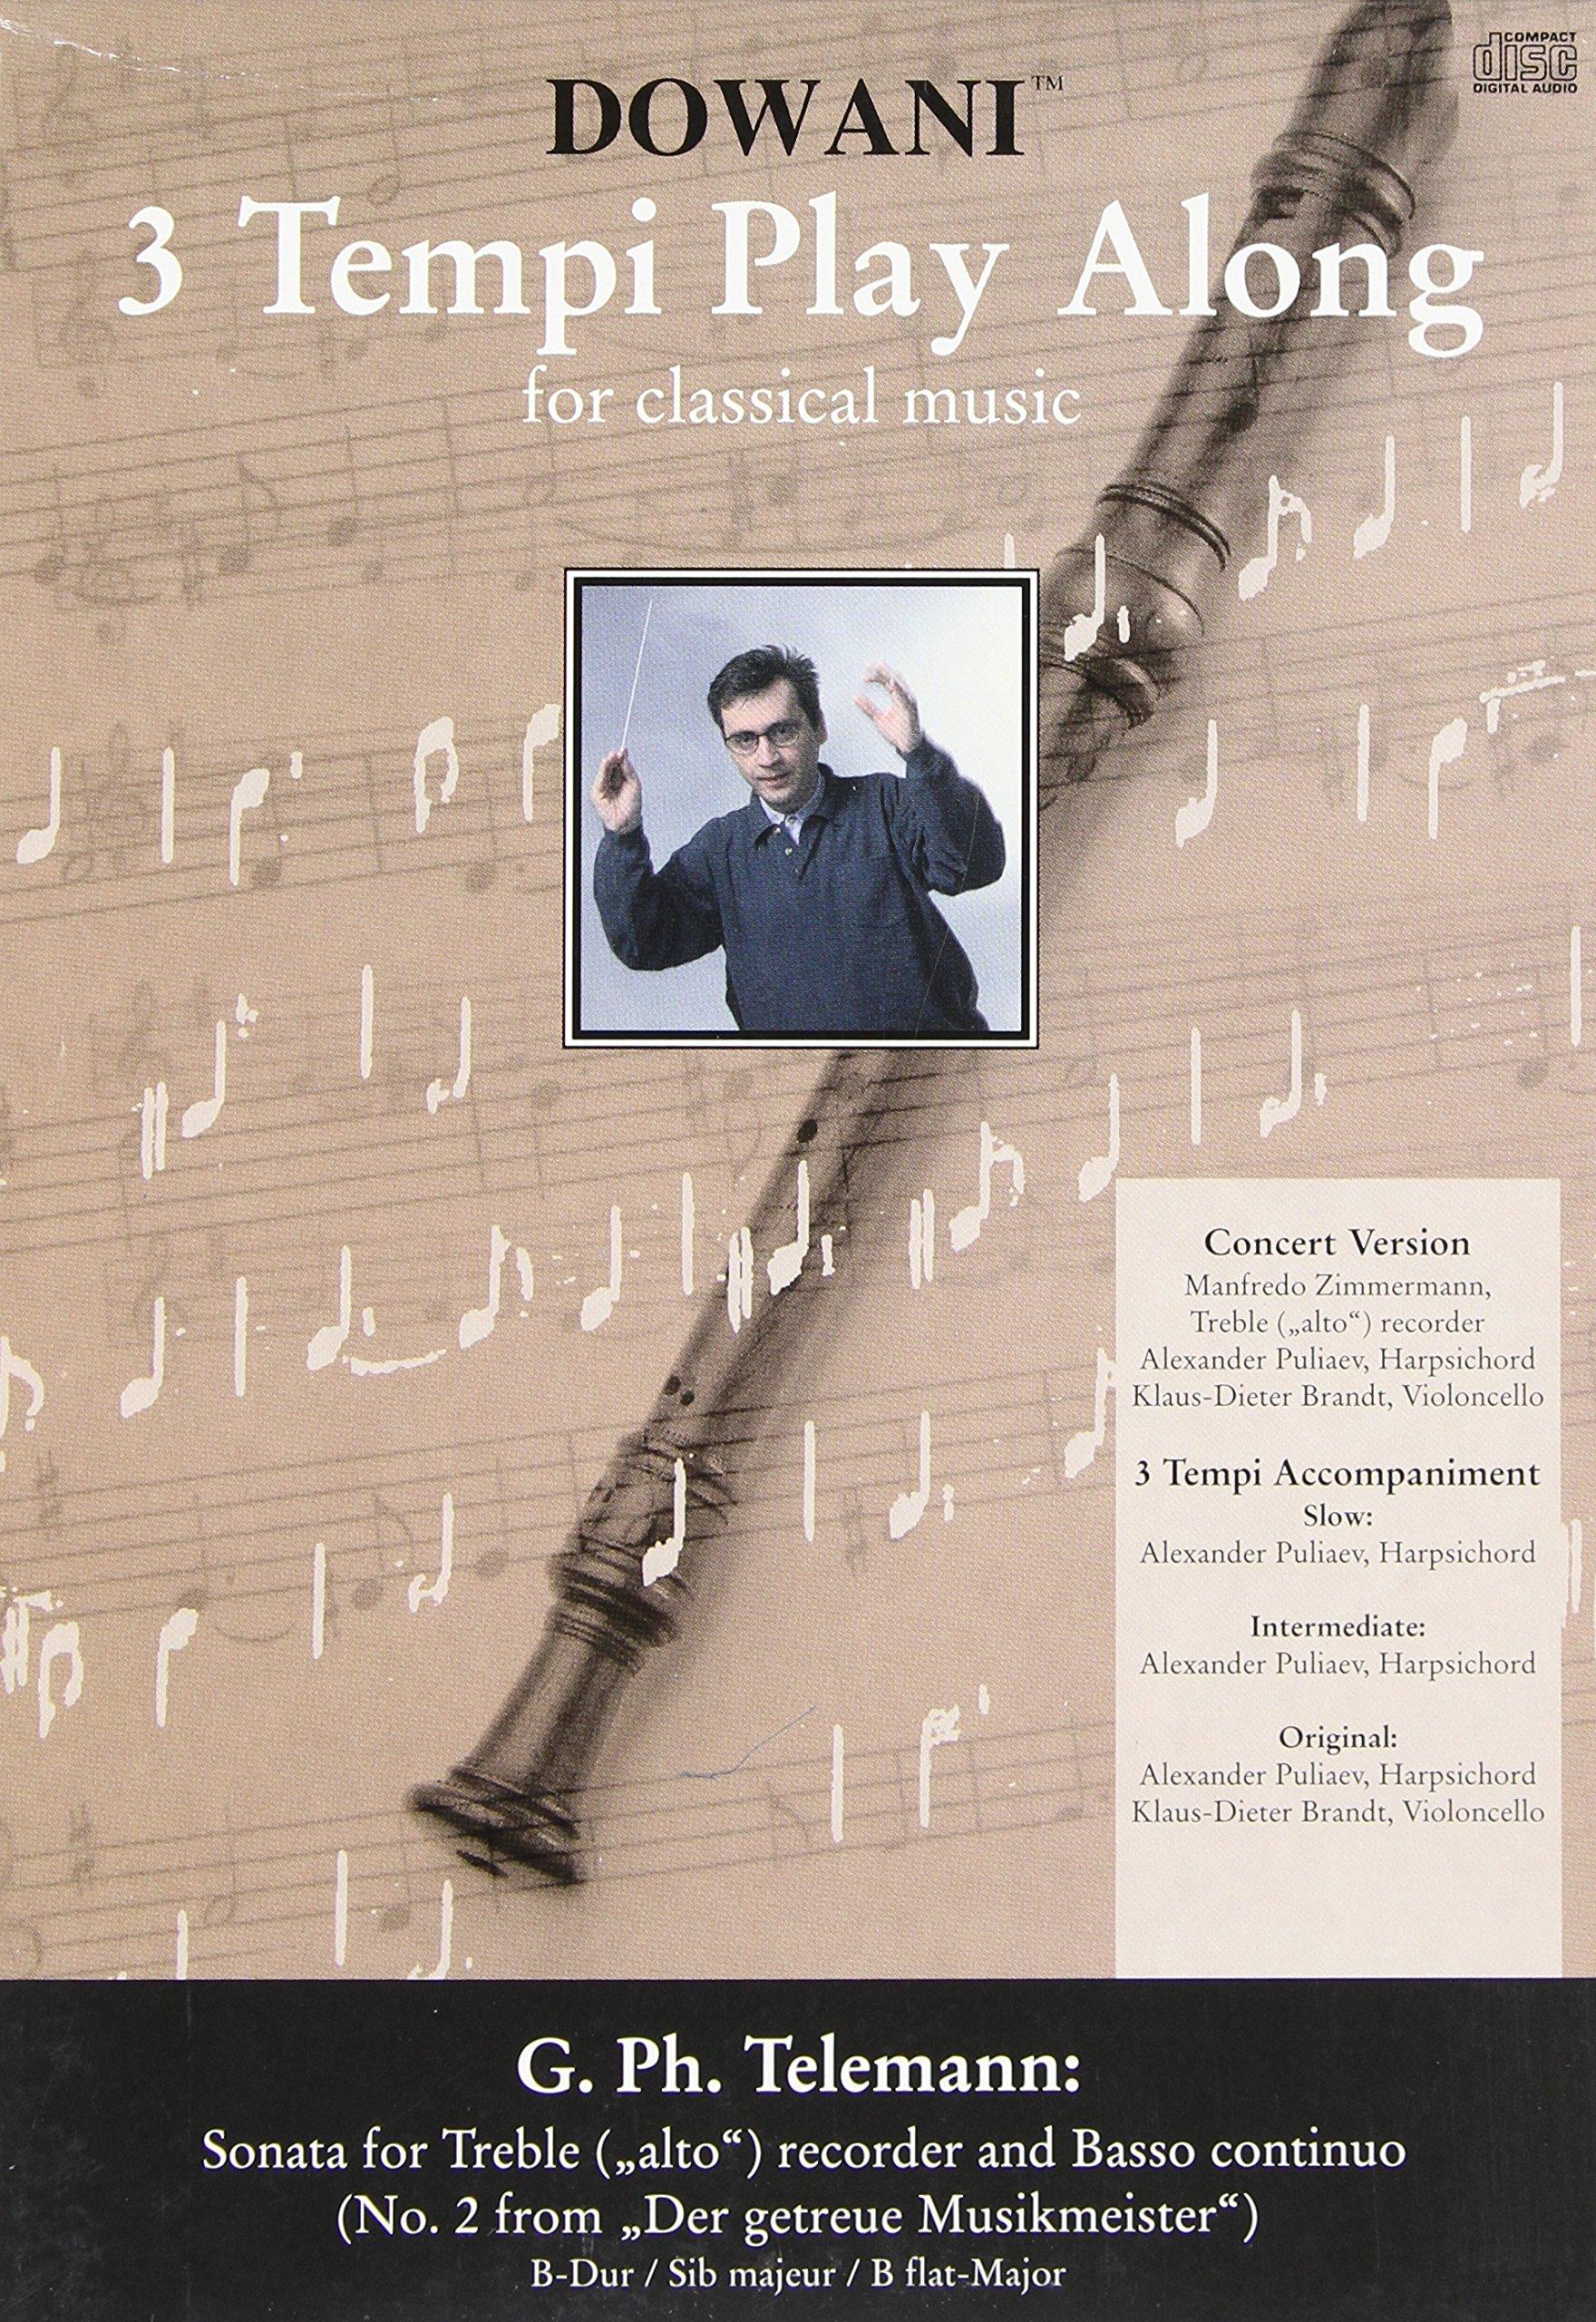 SONATA IN B FLAT MAJOR FOR TREBLE (ALTO) RECORDER AND BASSO CONTINUO OLD PKG (Dowani 3 Tempi Play Along)